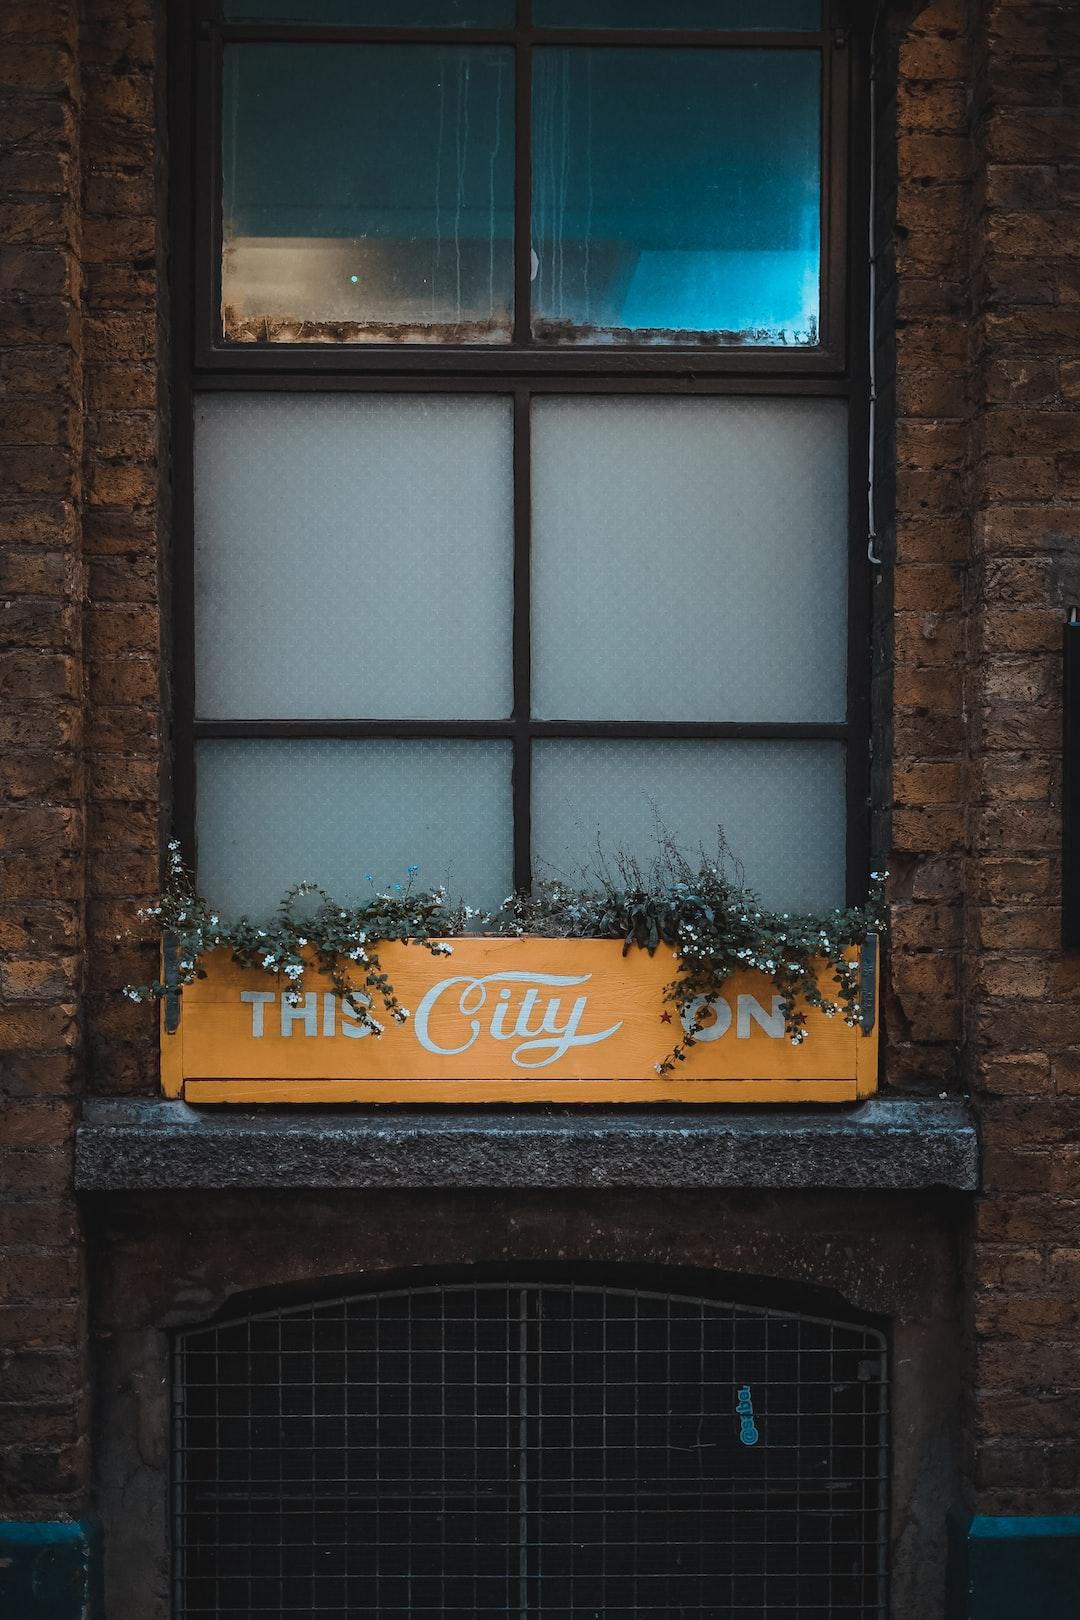 the window ledge of Breakfast Club in Shoreditch.